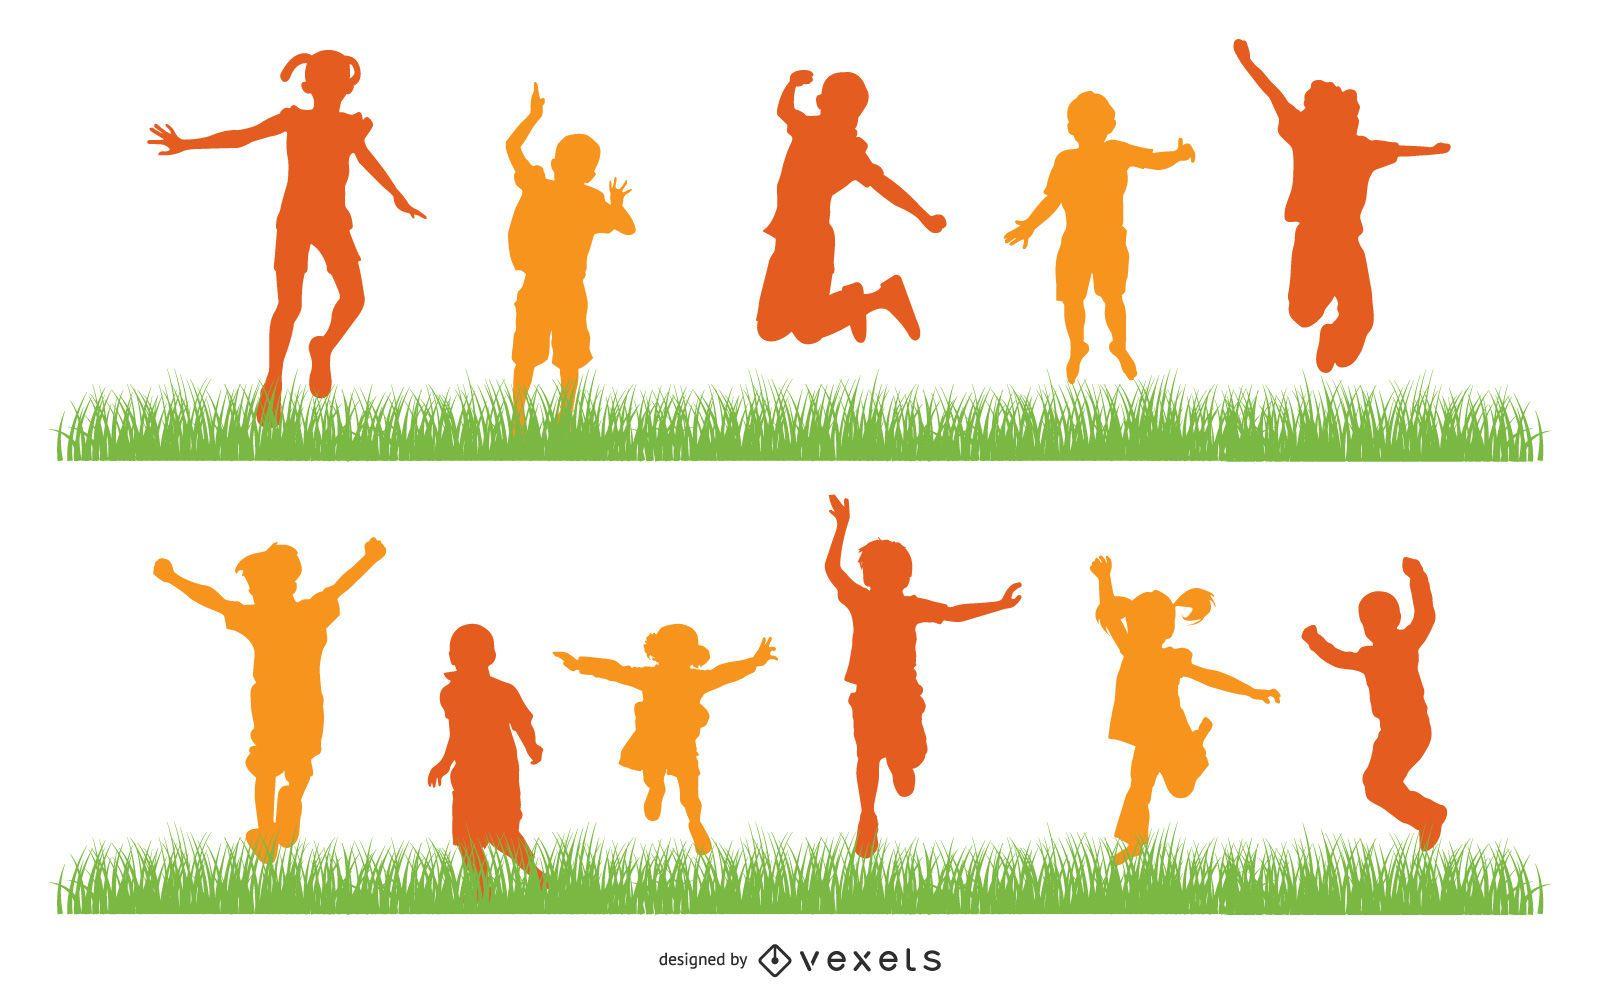 Conjunto de silueta de niños saltando